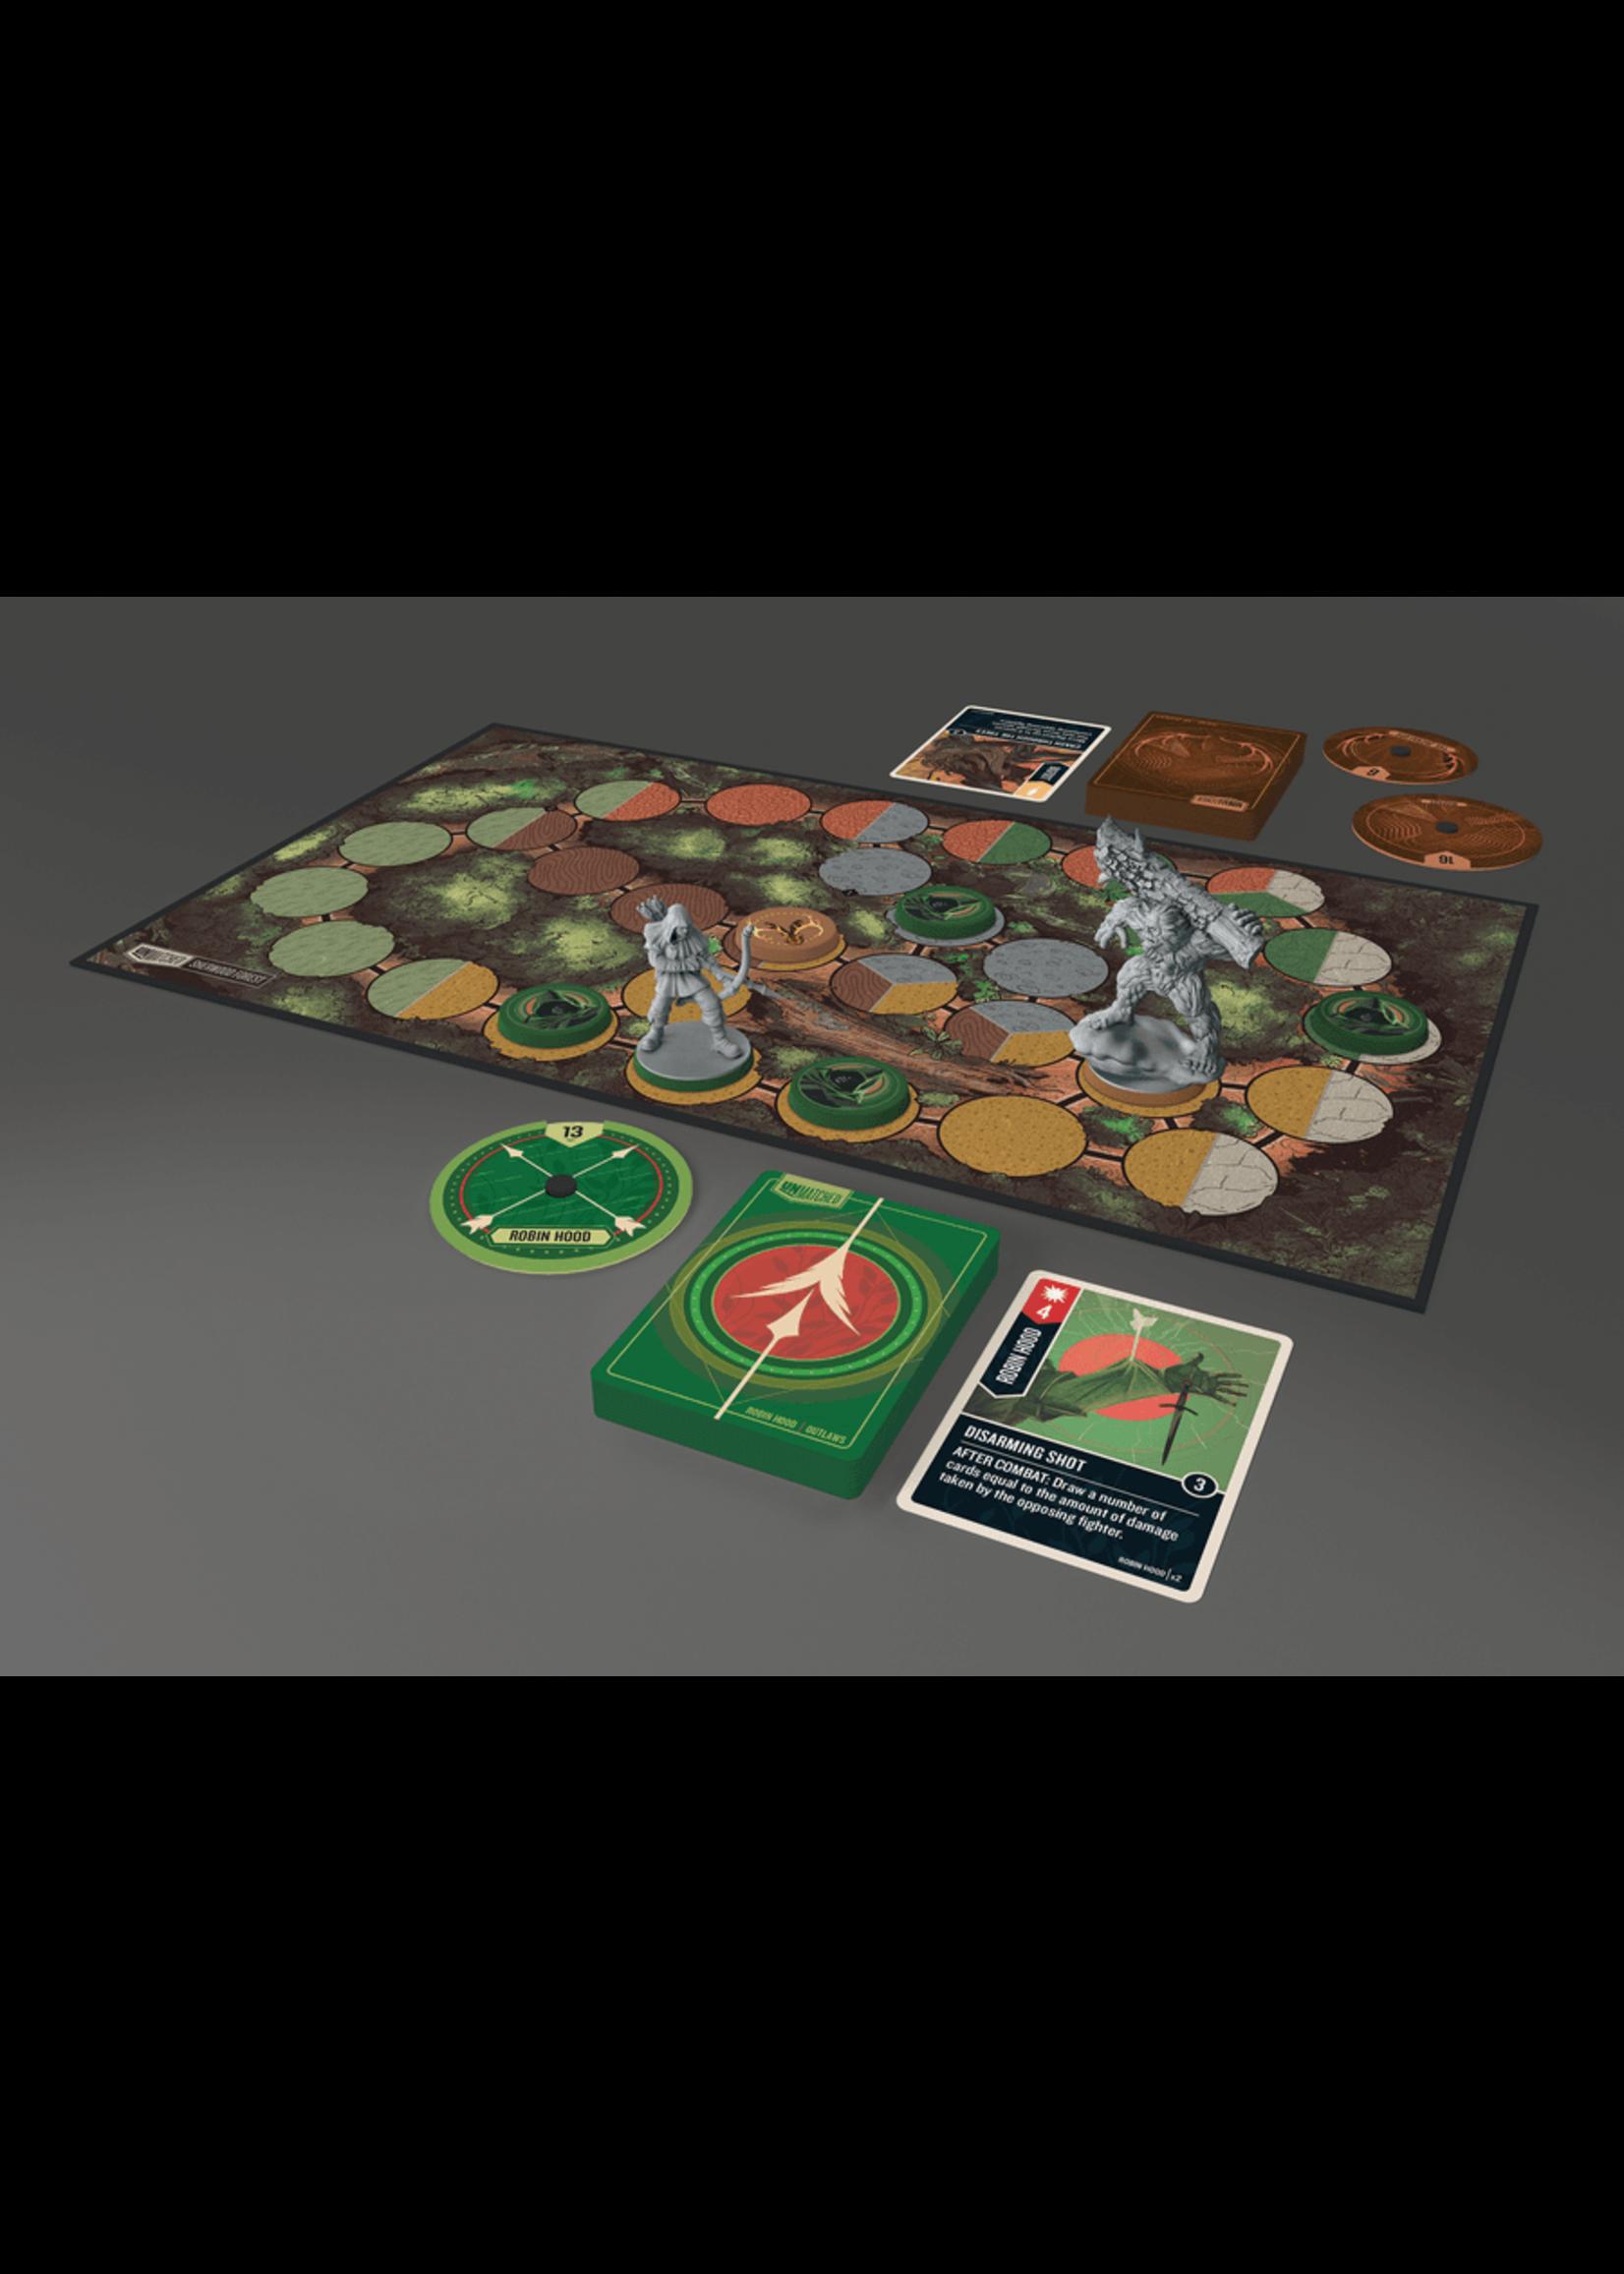 Unmatched: Battle of Legends Vol. 2 - Robin Hood vs. Bigfoot